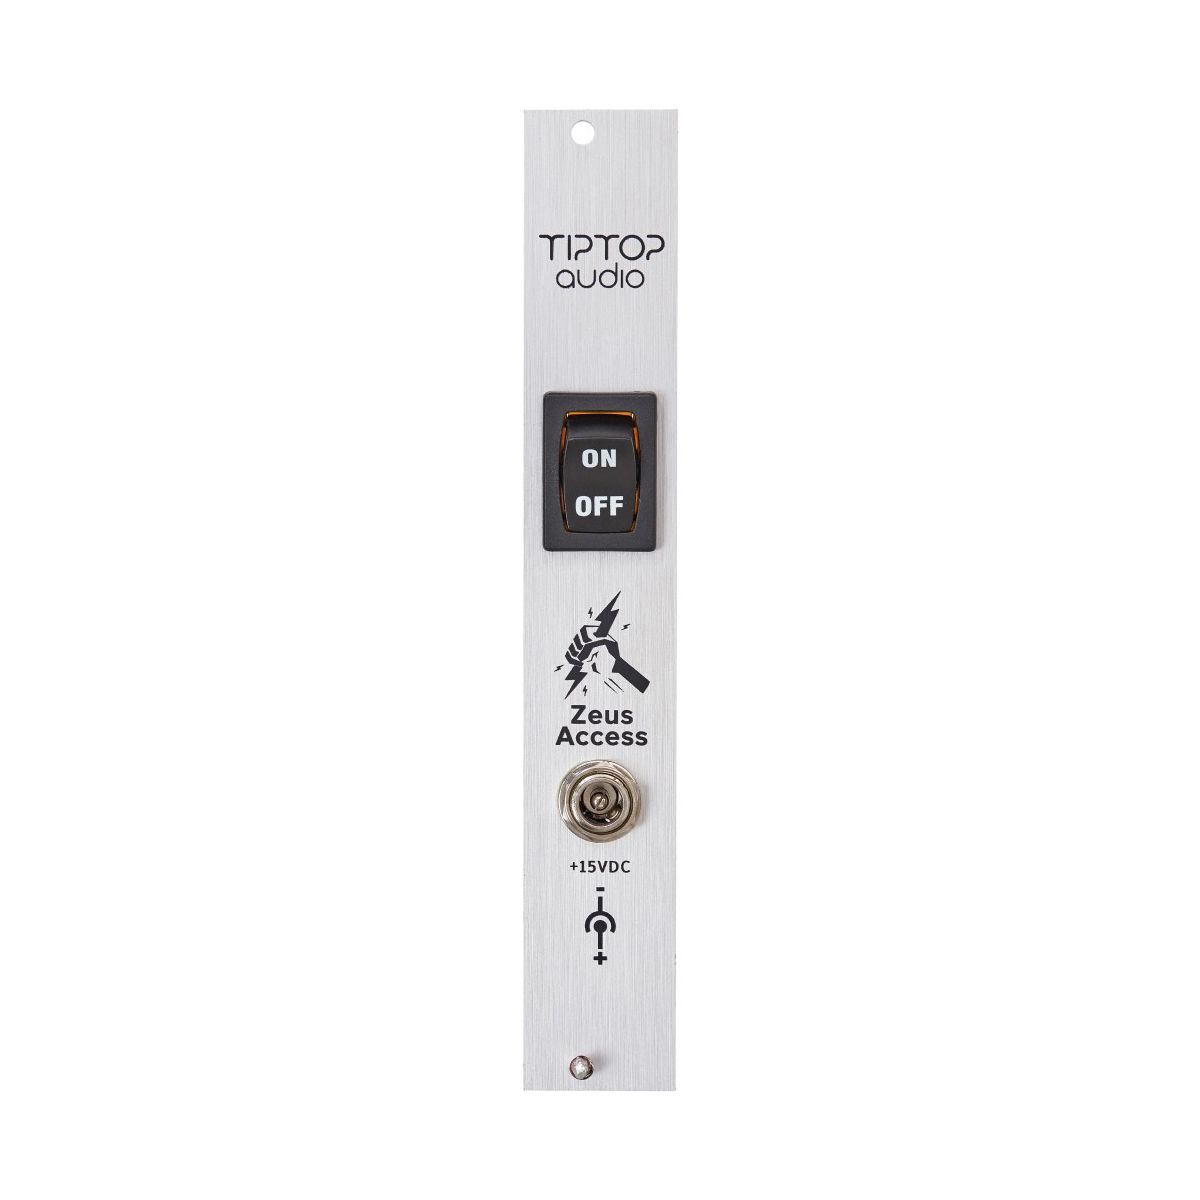 TipTop Audio Zeus Access Eurorack Power Input Module